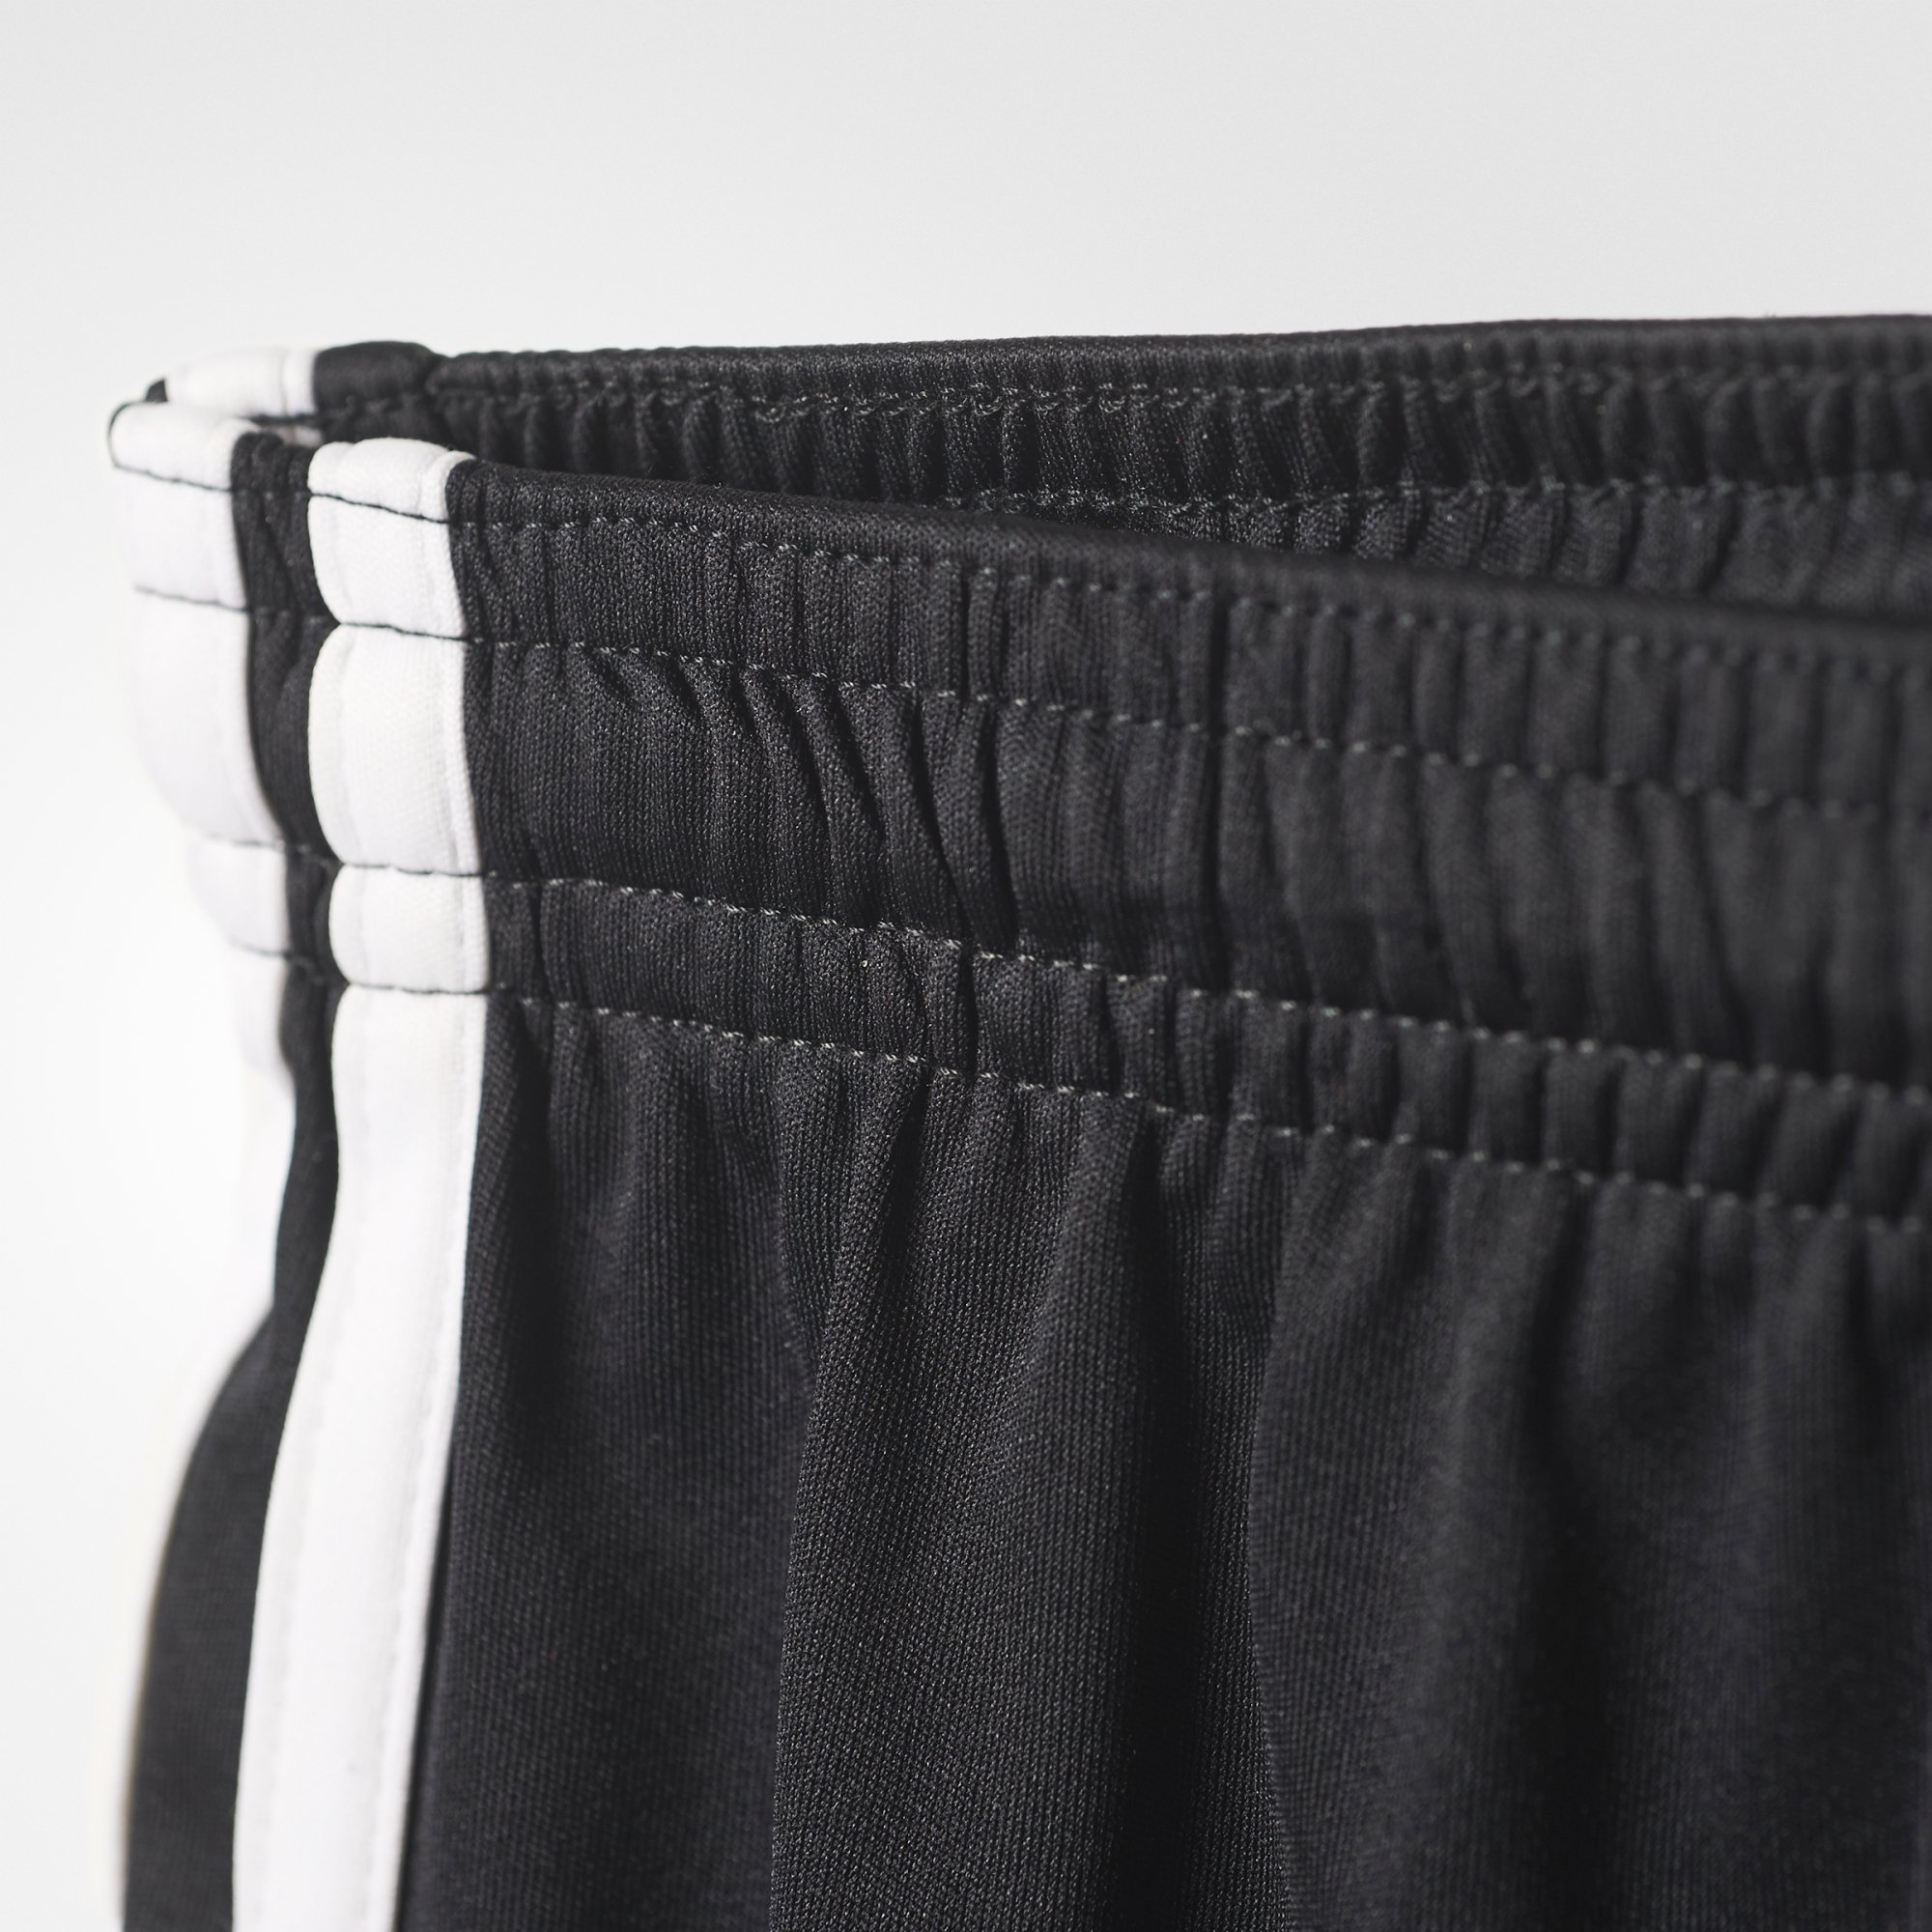 Adidas Womens Climacool Regista 16 Short Small Black/White by adidas